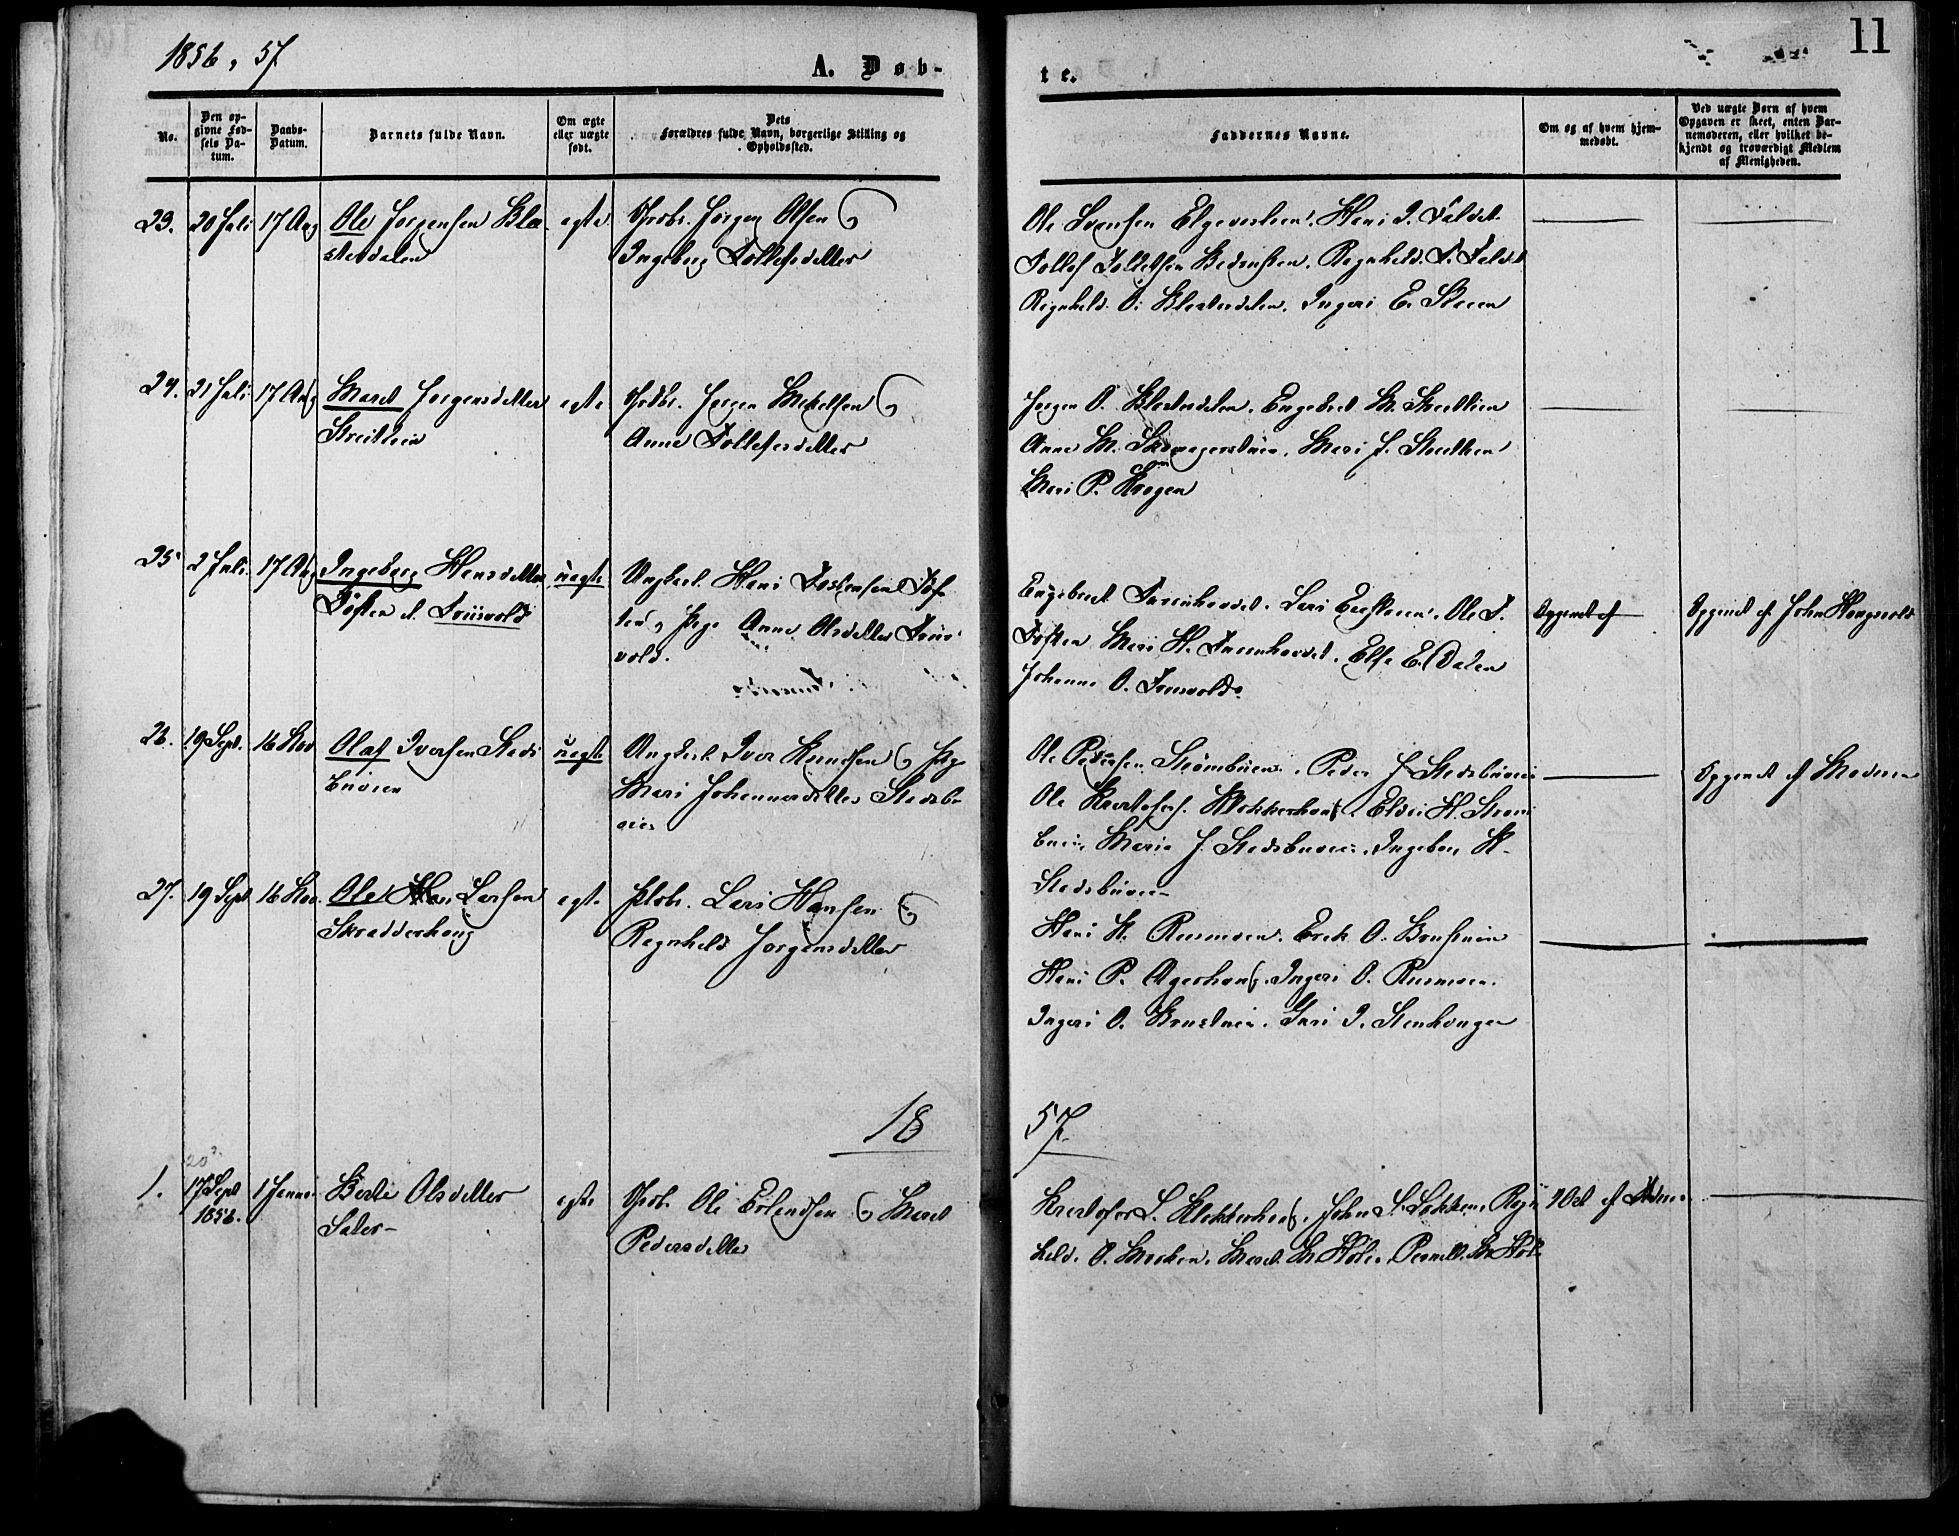 SAH, Lesja prestekontor, Ministerialbok nr. 7, 1854-1862, s. 11